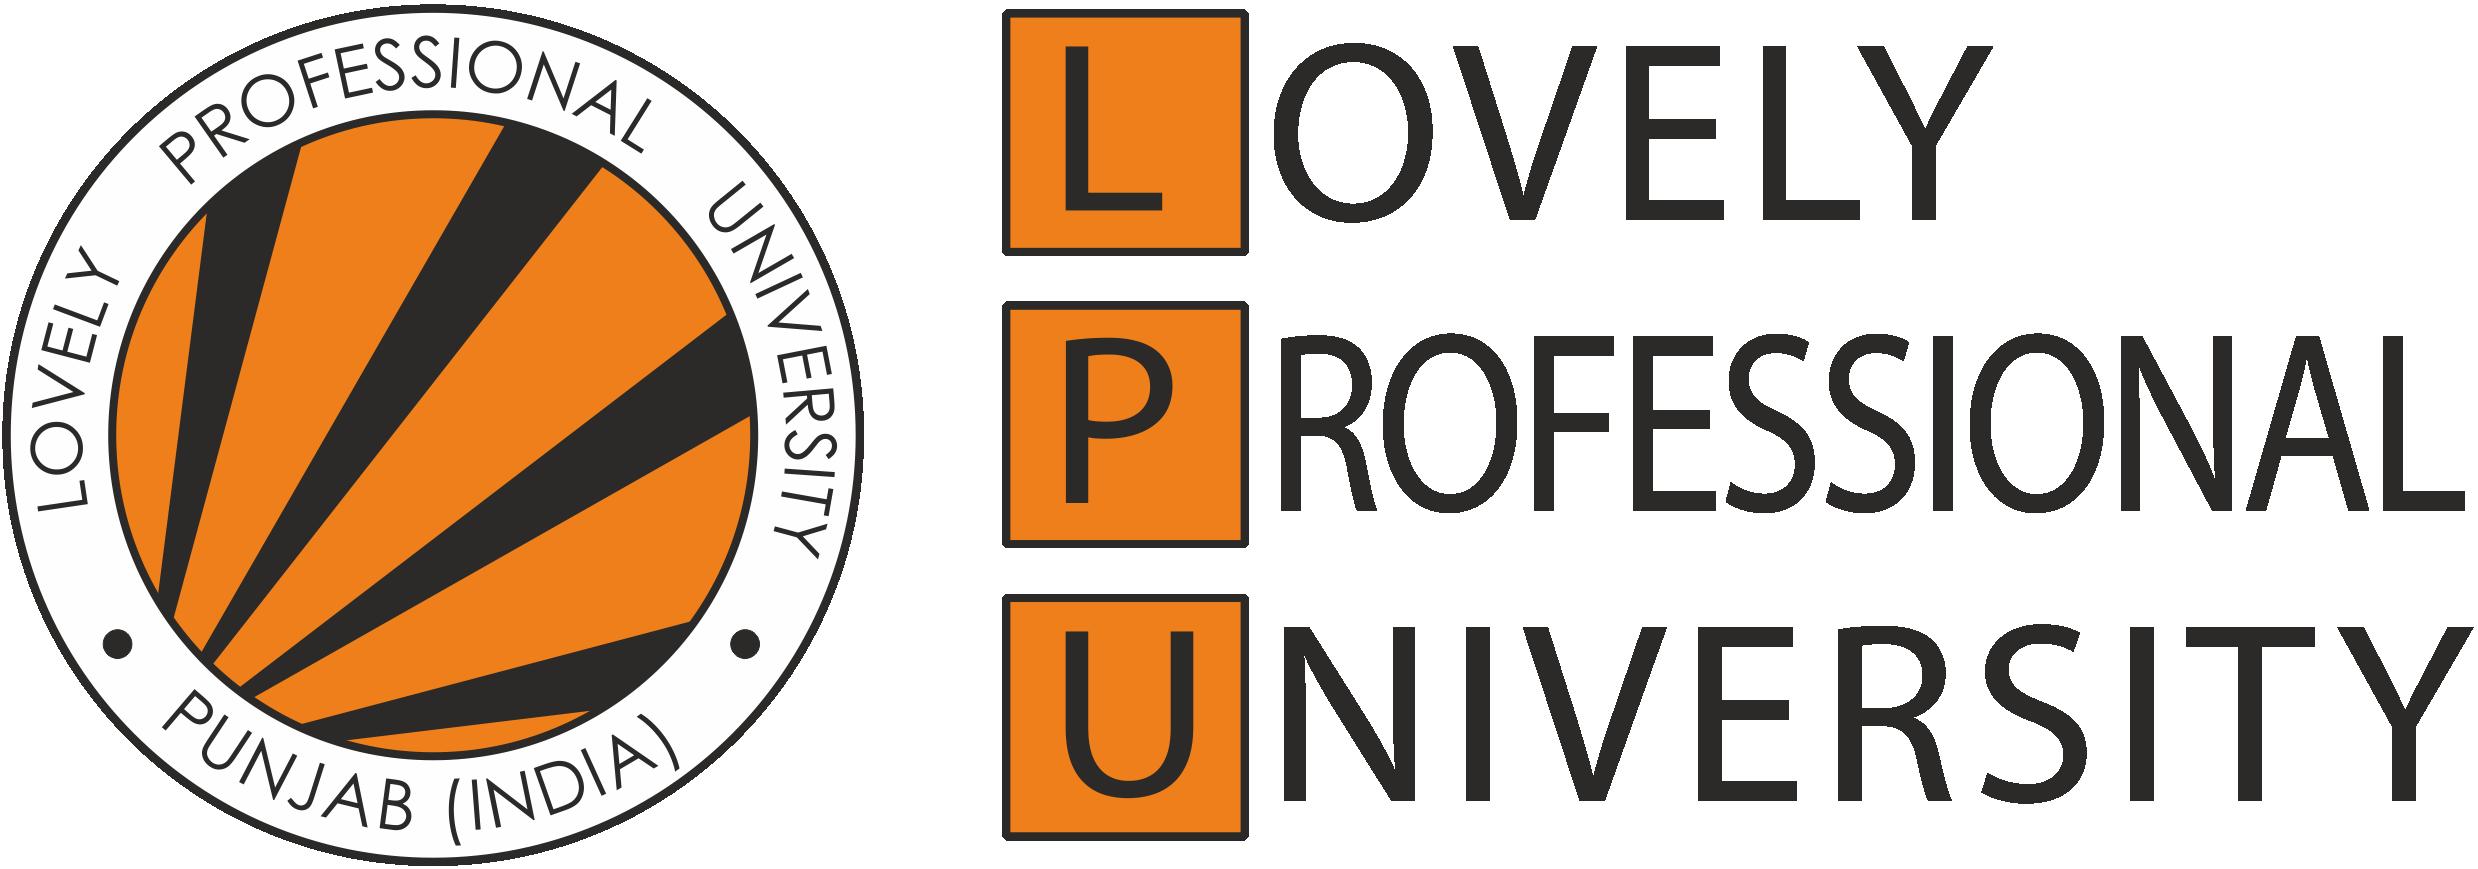 LPU Logo Lovely Professional University Previous year